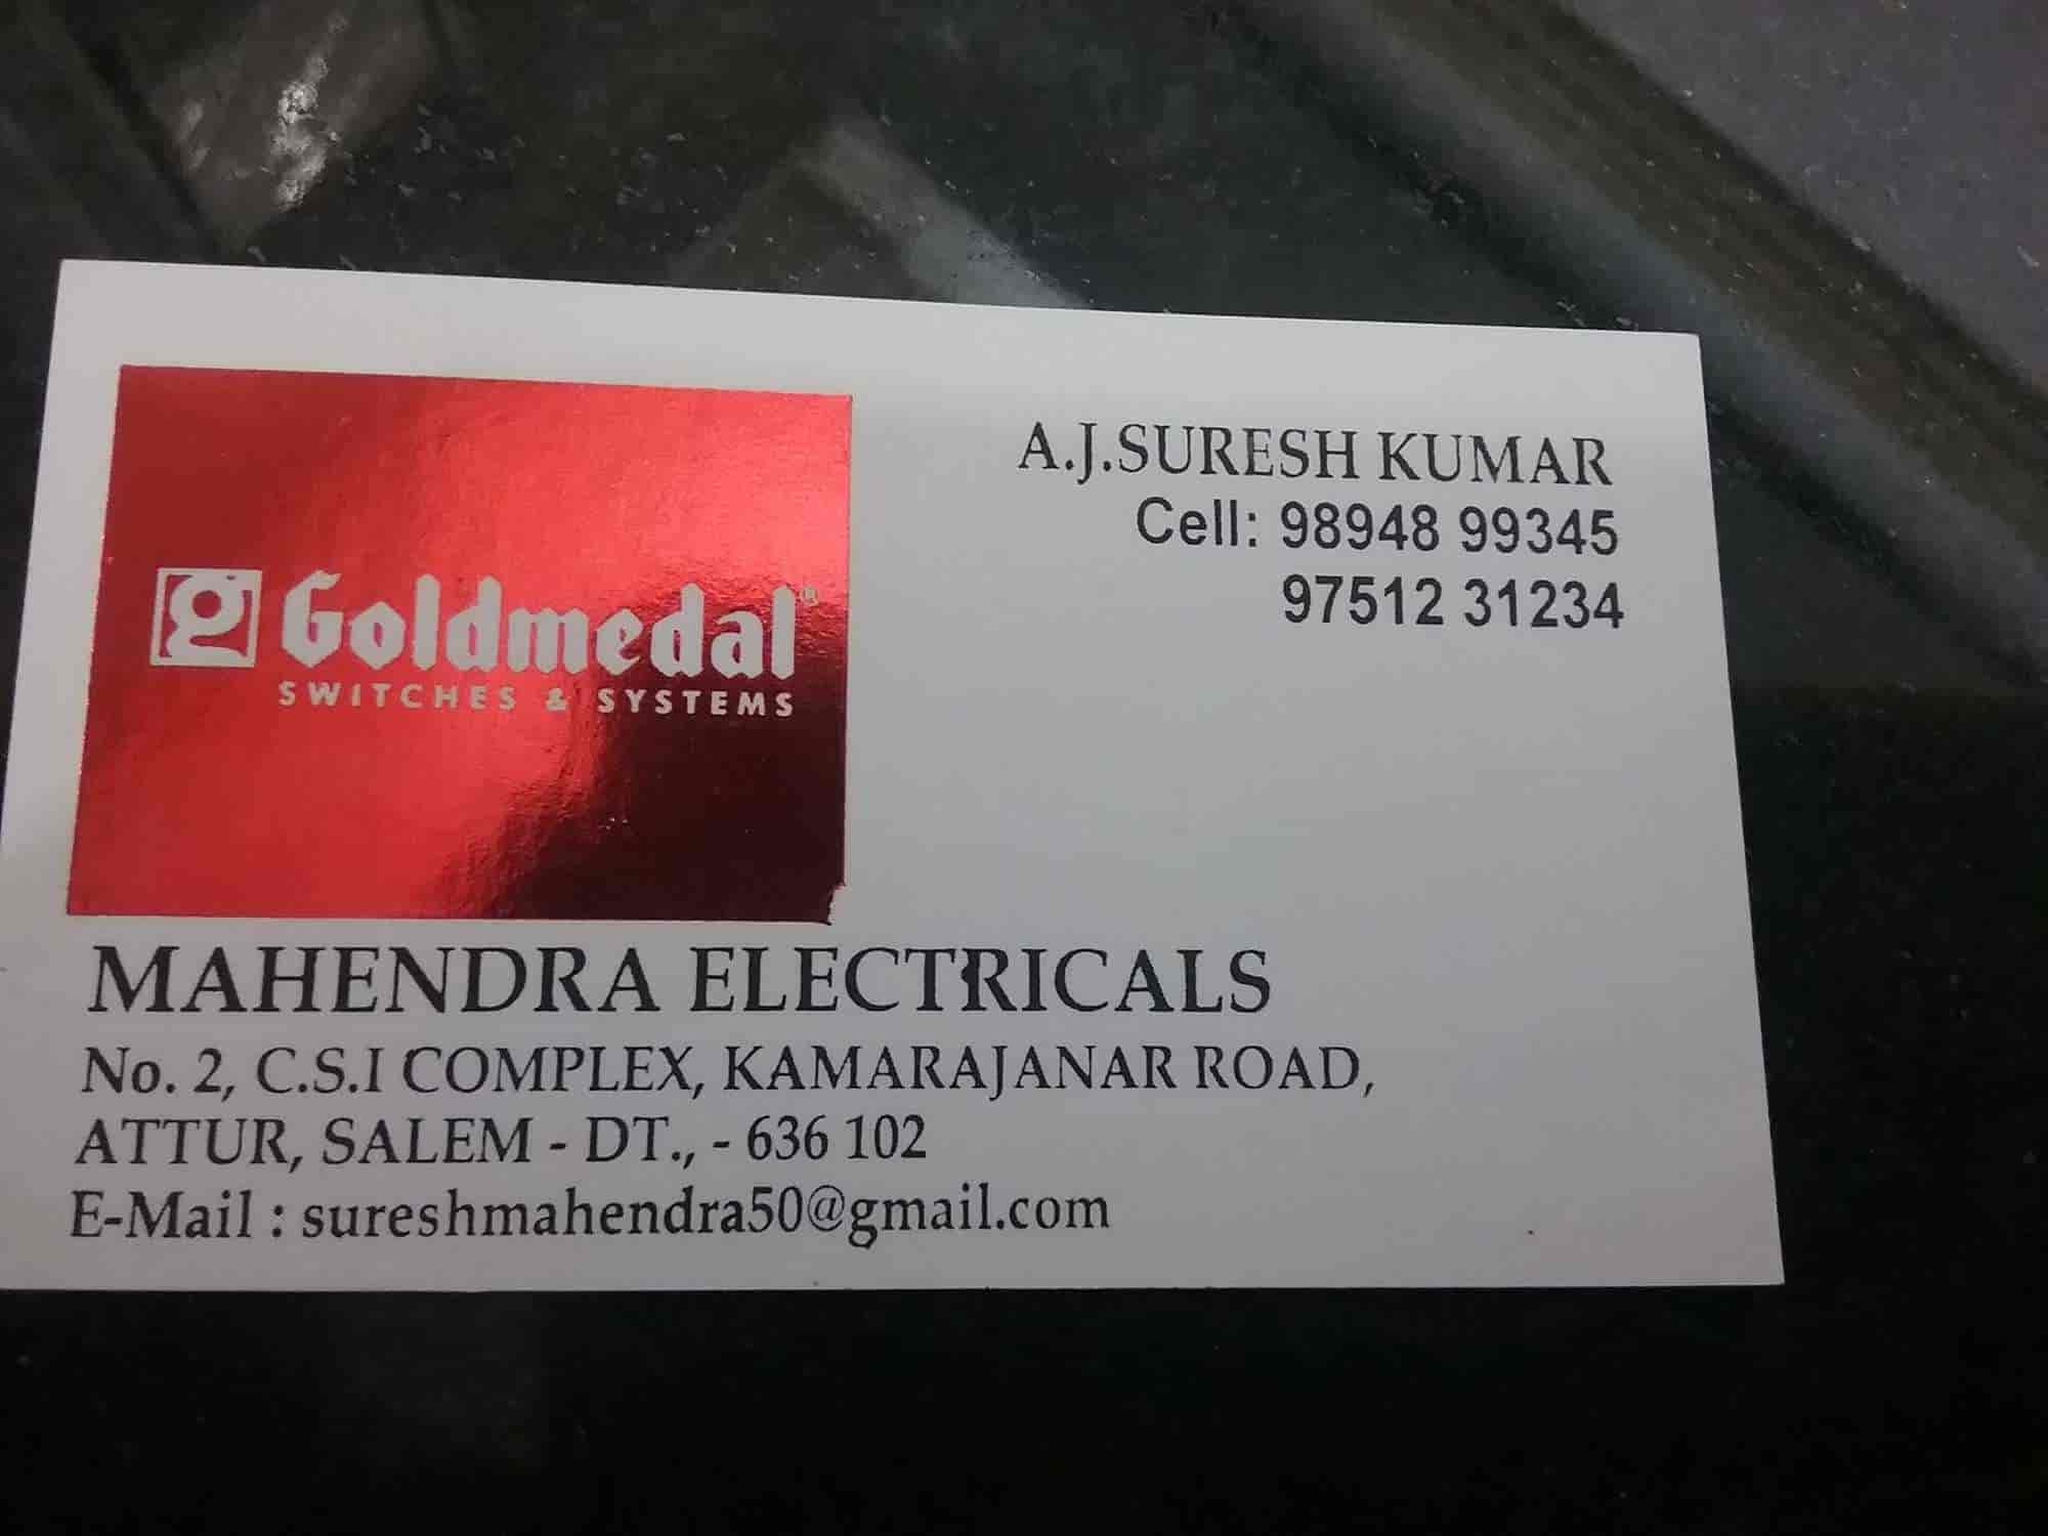 Mahendra Electricals, Attur Salem - Industrial Electrical